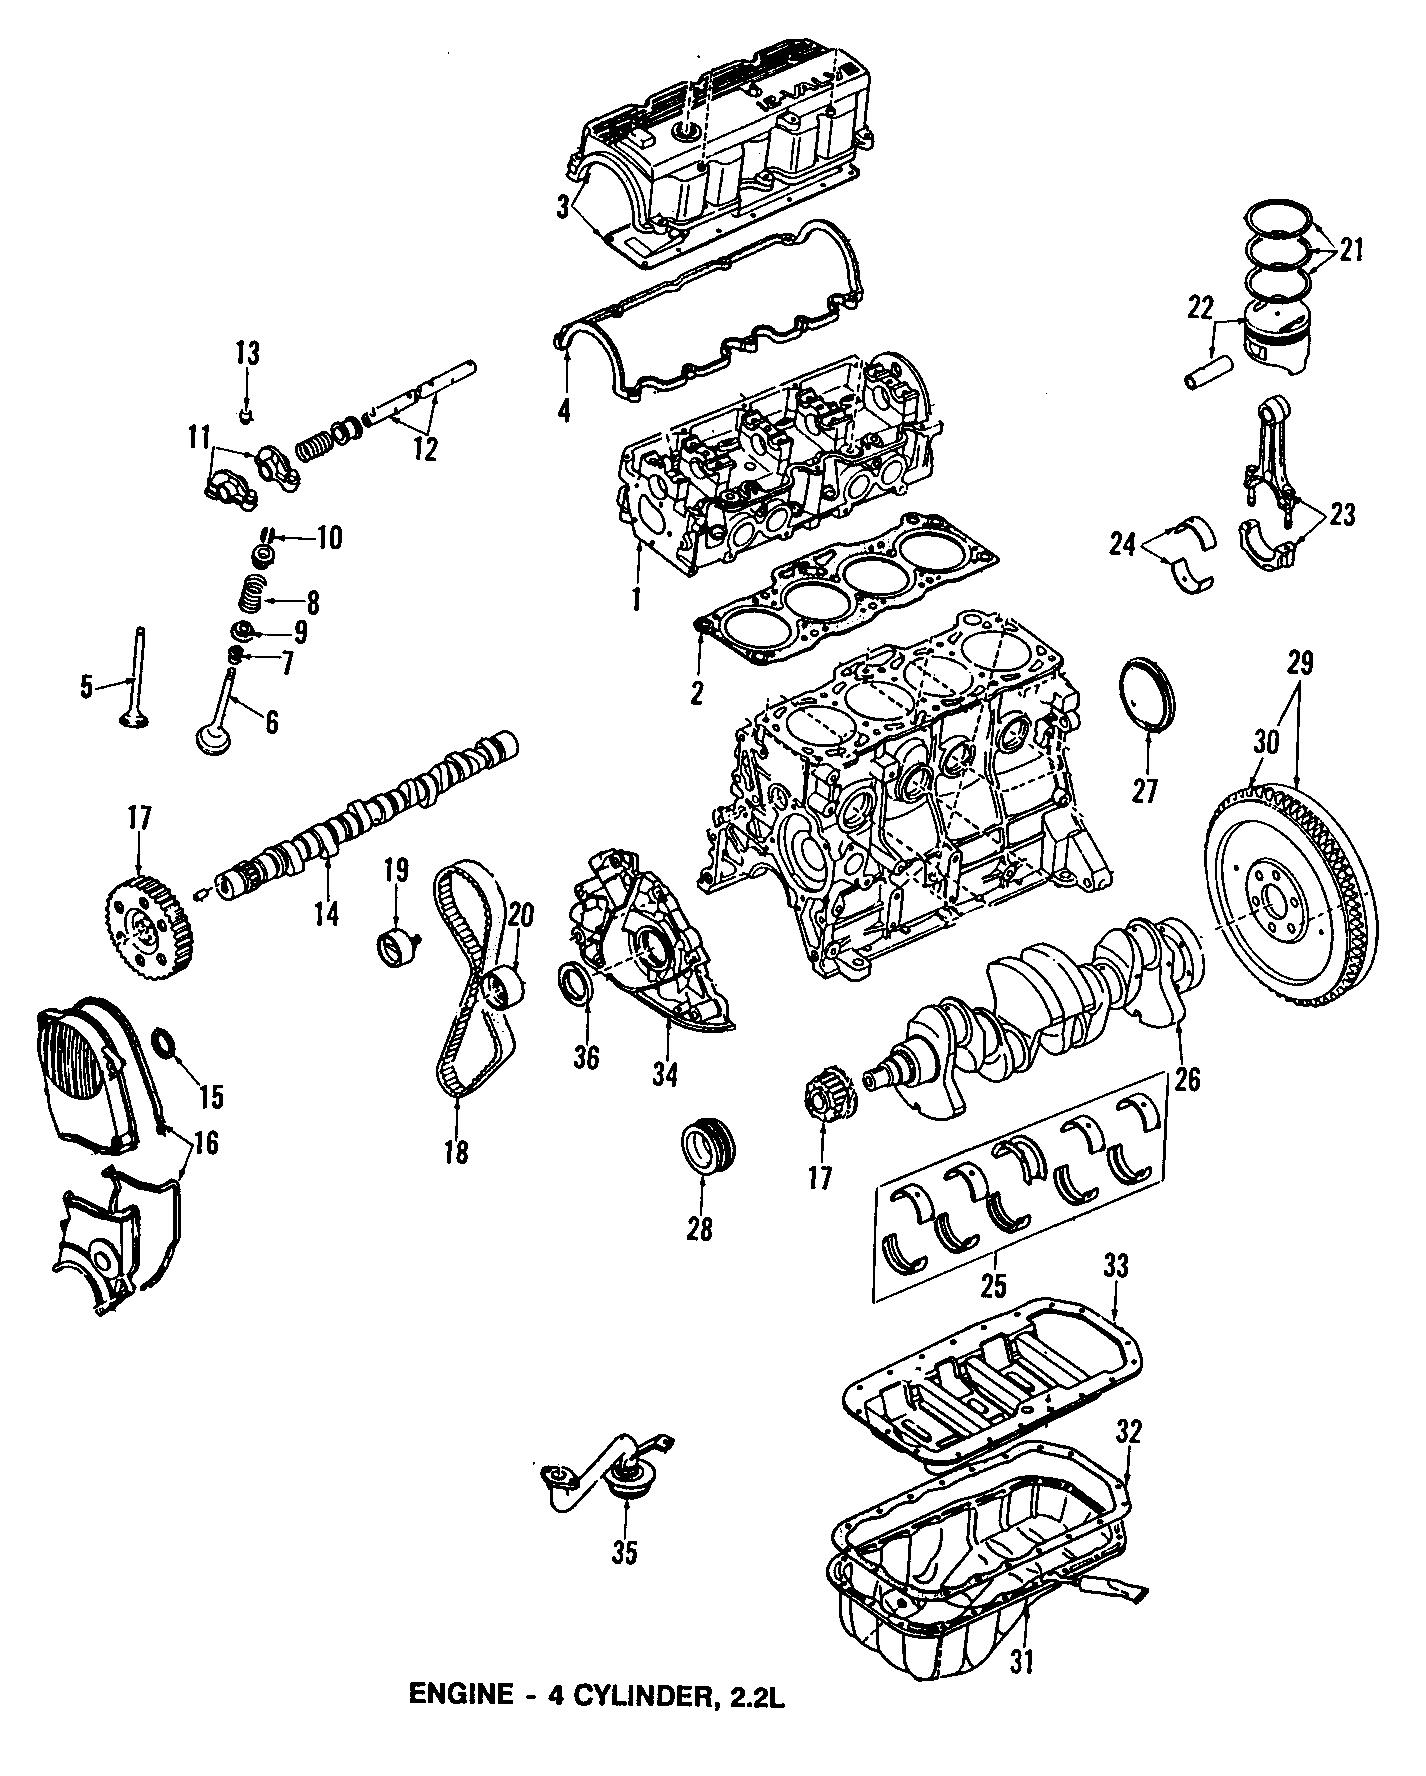 Fe1h12425